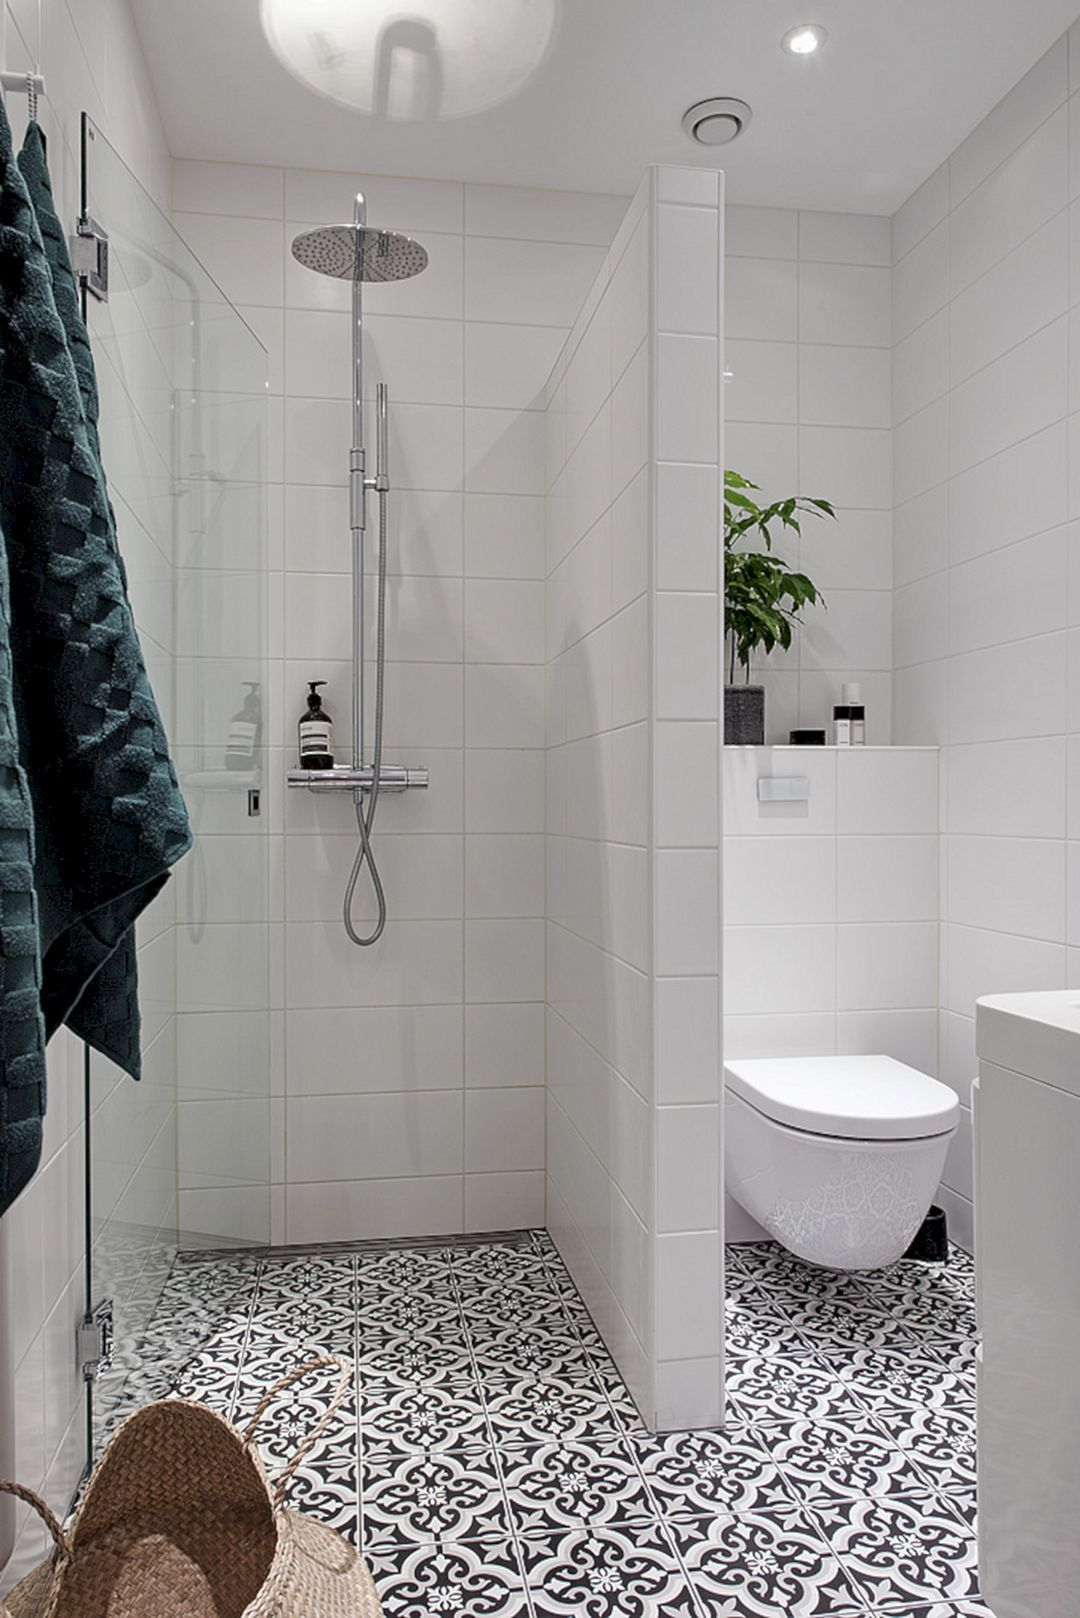 115 Extraordinary Small Bathroom Designs For Small Space 036 Small Bathroom Layout Bathroom Design Small Small Bathroom